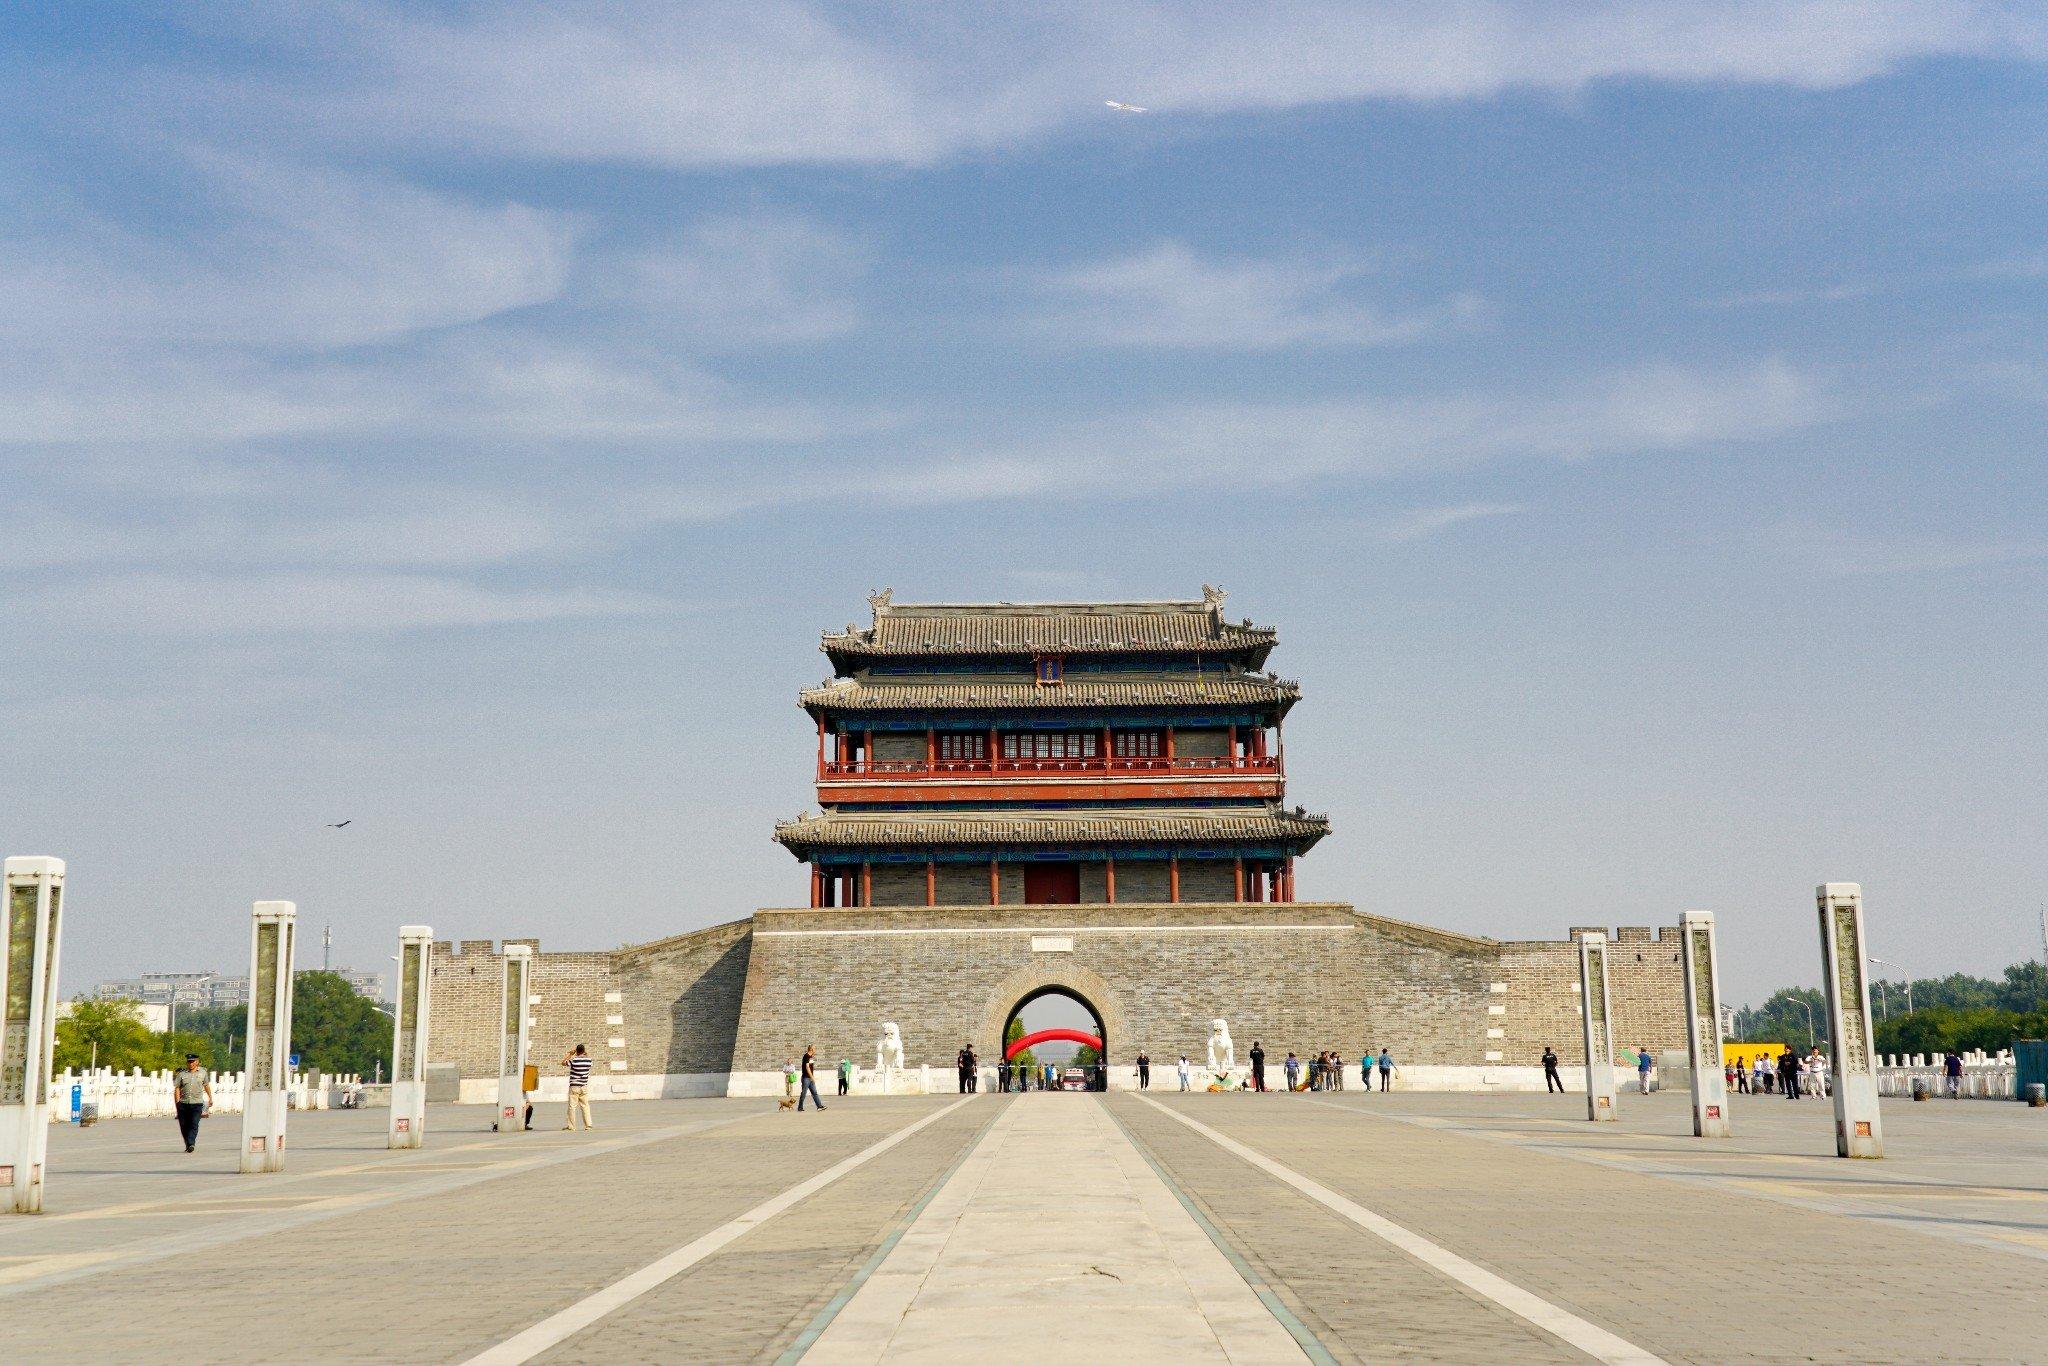 Th1s is BEIJING  玩味中轴线,皇城根下的老北京